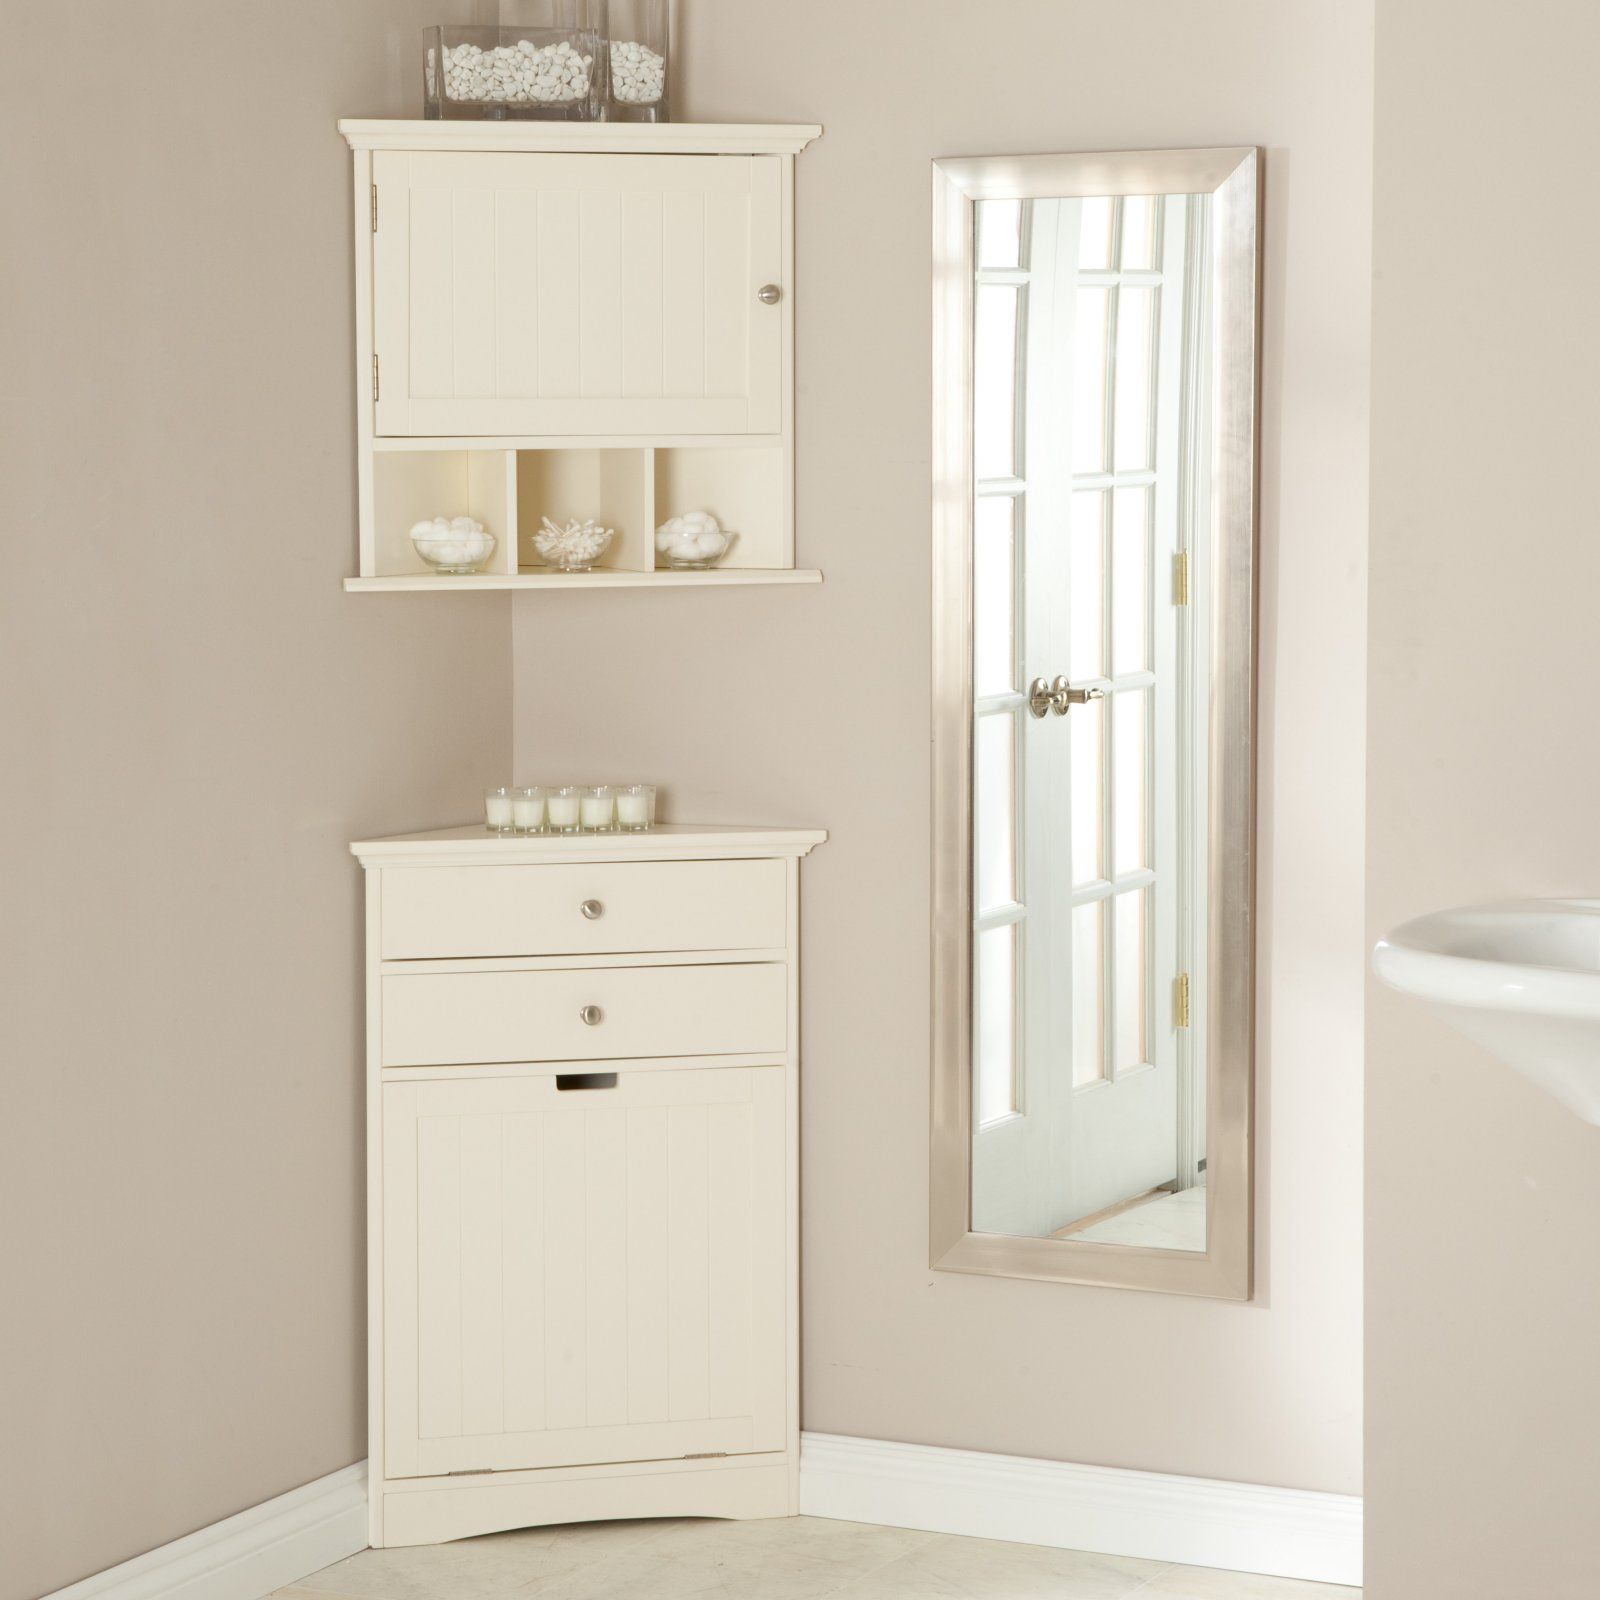 Bathroom Ideas Bathroom Corner Cabinet Corner Storage Cabinet Bathroom Cabinets Designs